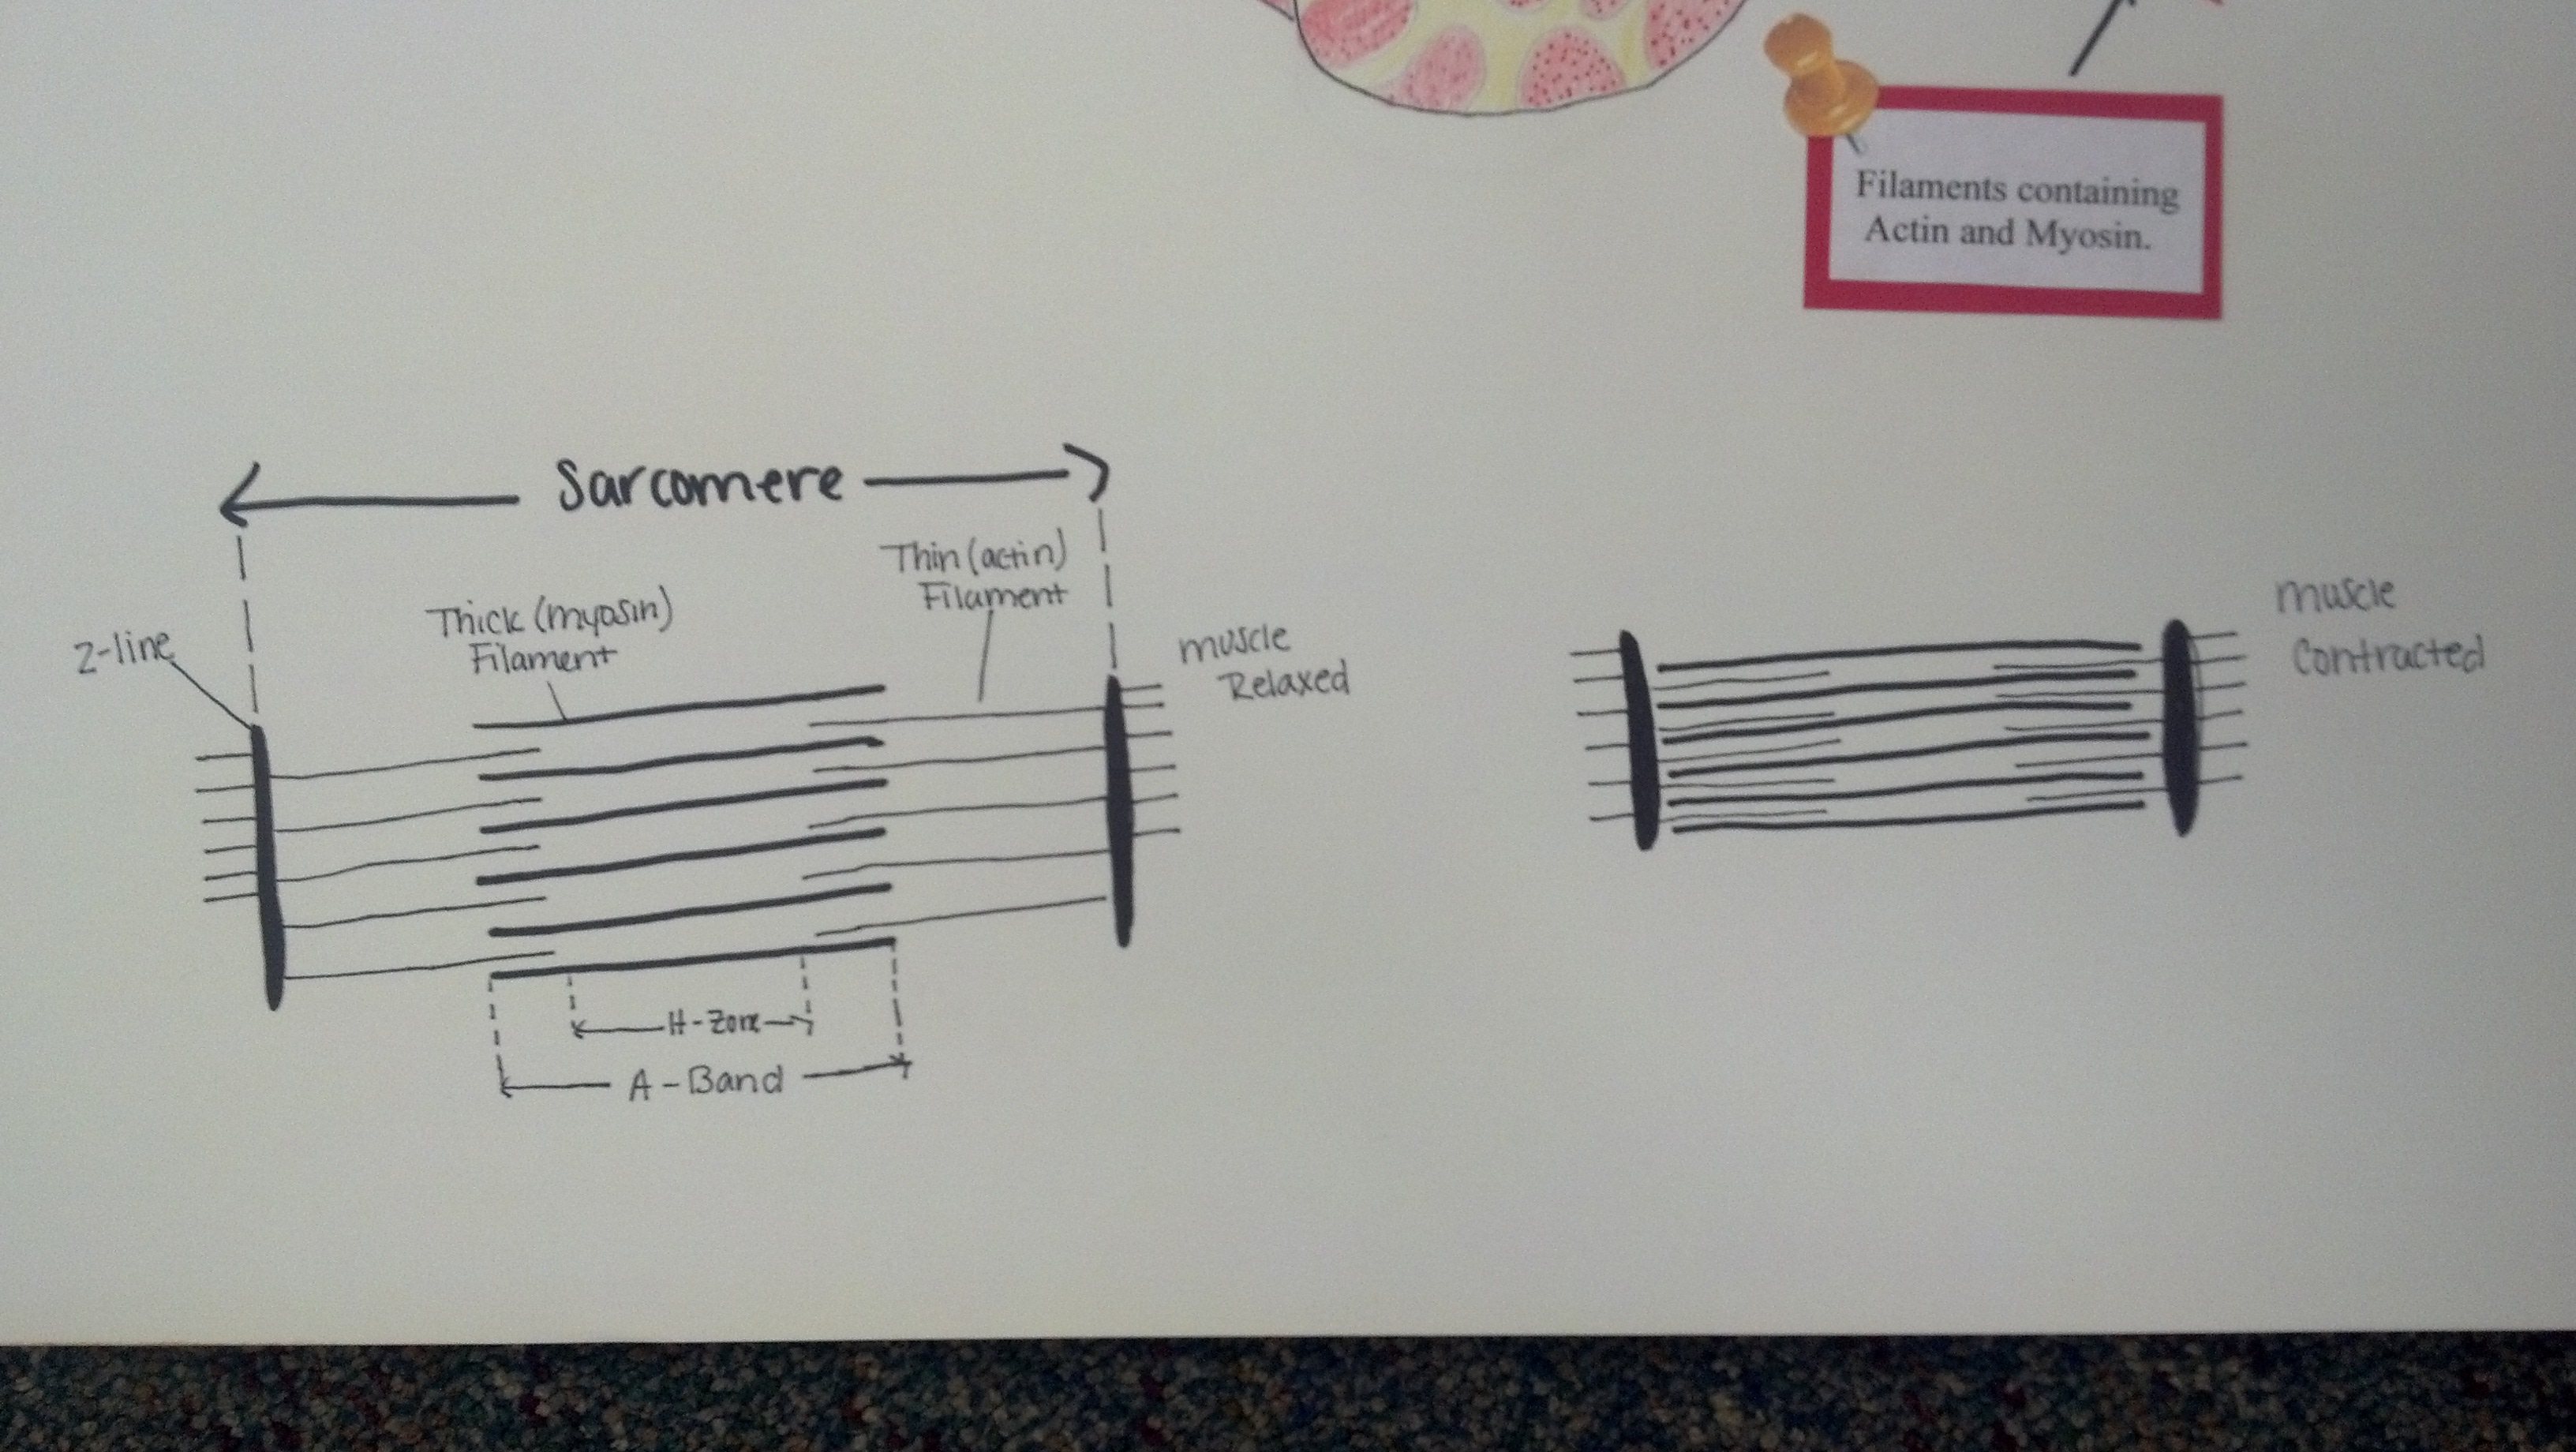 sarcomere diagram to label car led light wiring the sliding filament theory tiffanysanatomyblog